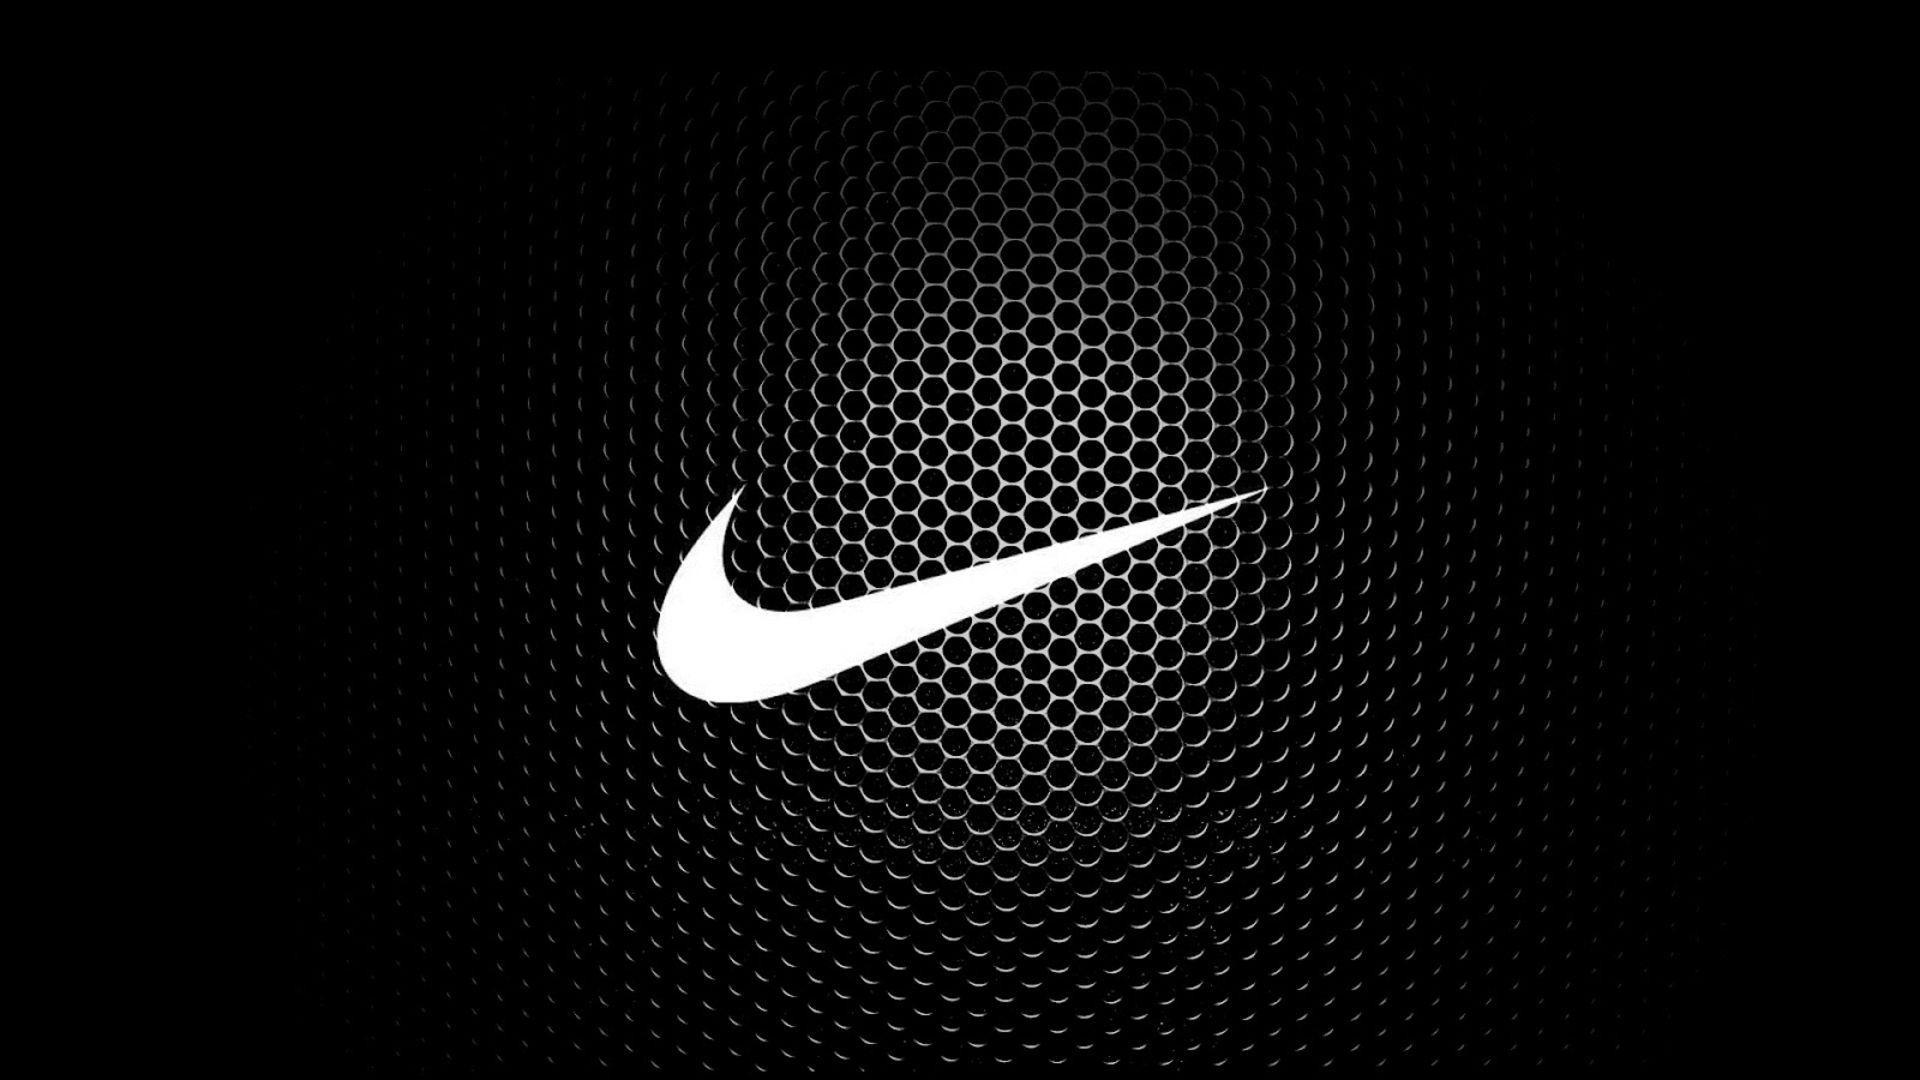 Nike Logo Wallpaper Hd 2018 64 Images